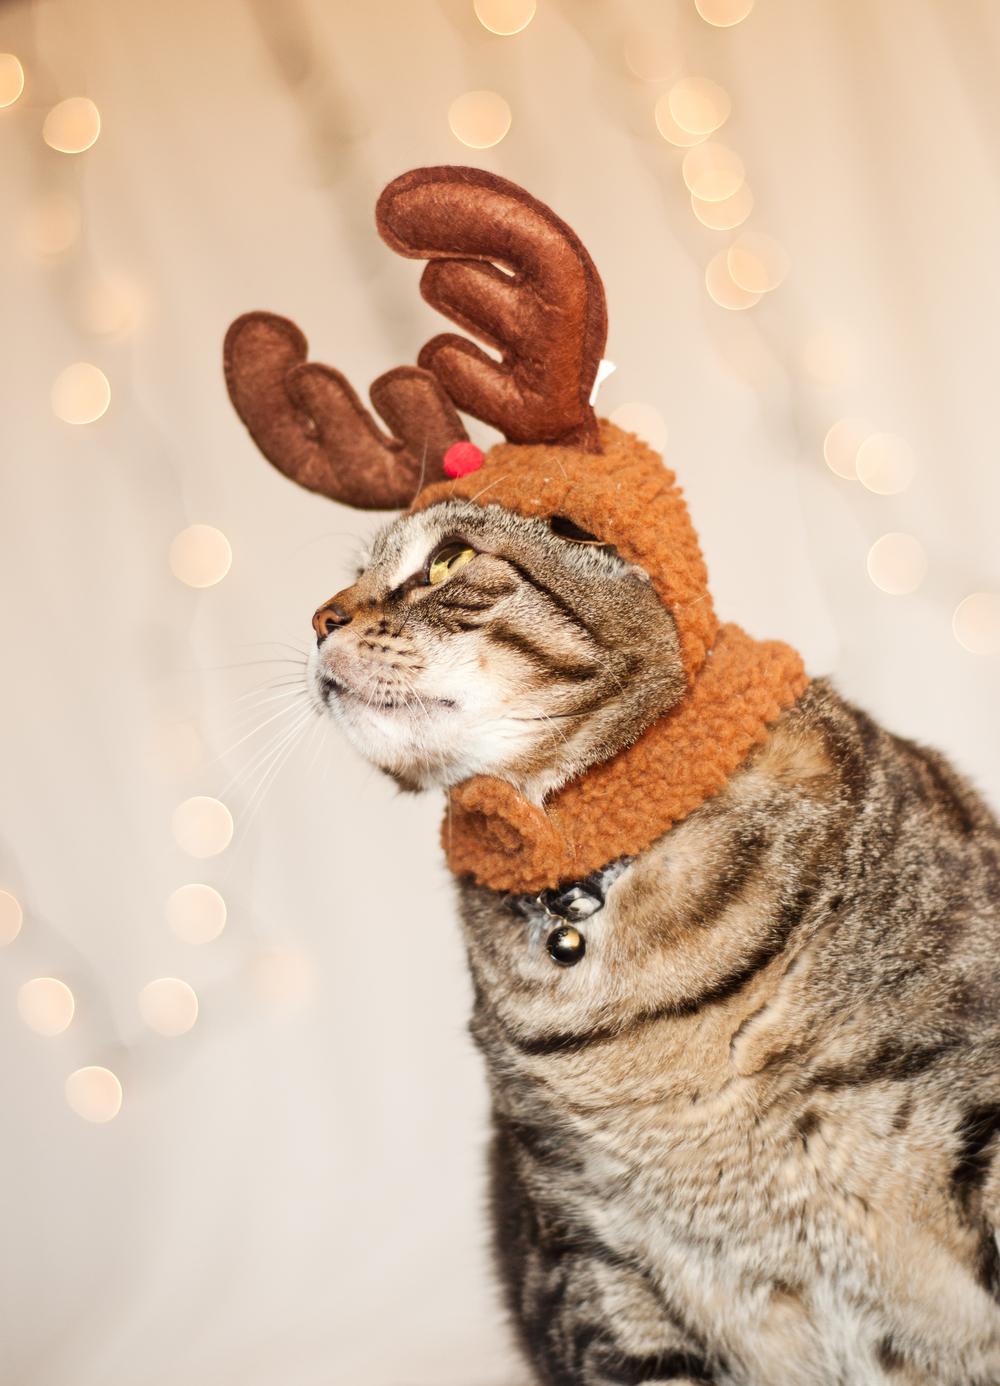 pet-photography-studio-natural-light-lifestyle-cat-reindeer-holiday-long-island-photographer-digital.jpg